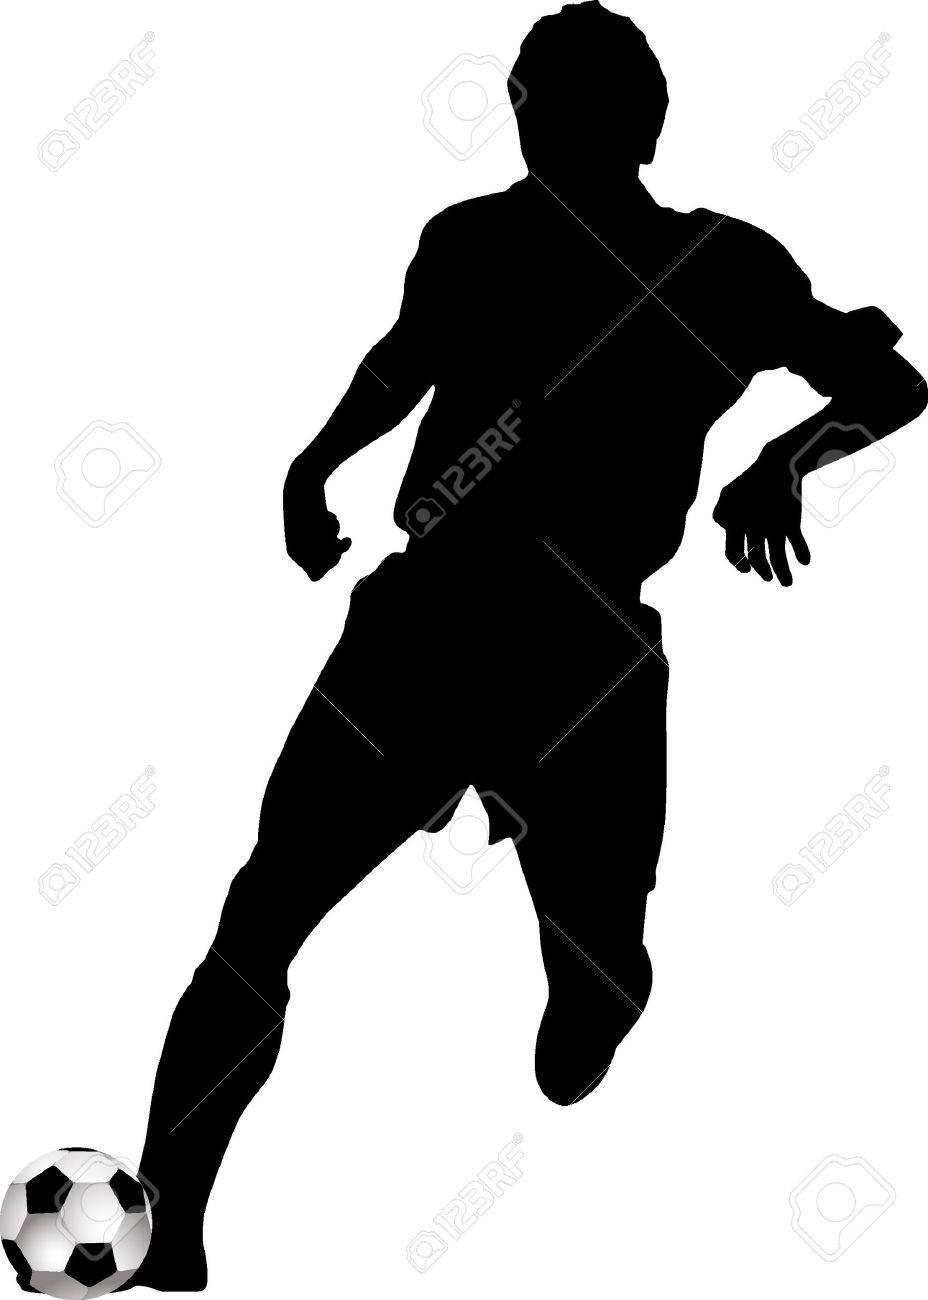 928x1300 Footballer Silhouette Black Football Player European Map